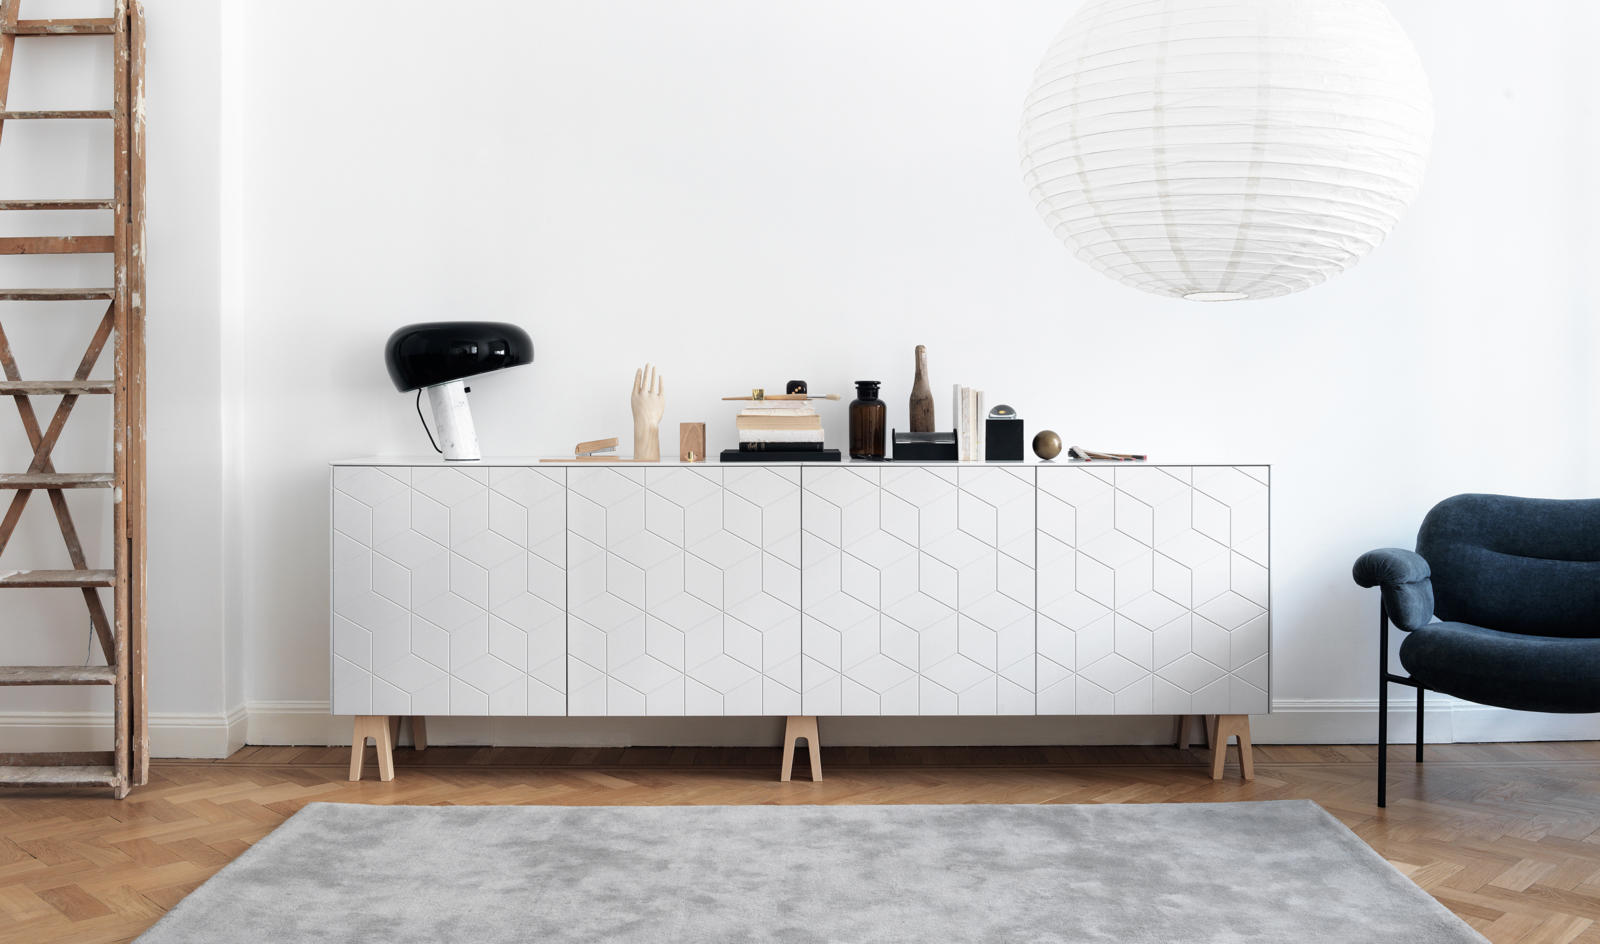 pimp your ikea so wird jedes m bel zum unikat all about design. Black Bedroom Furniture Sets. Home Design Ideas